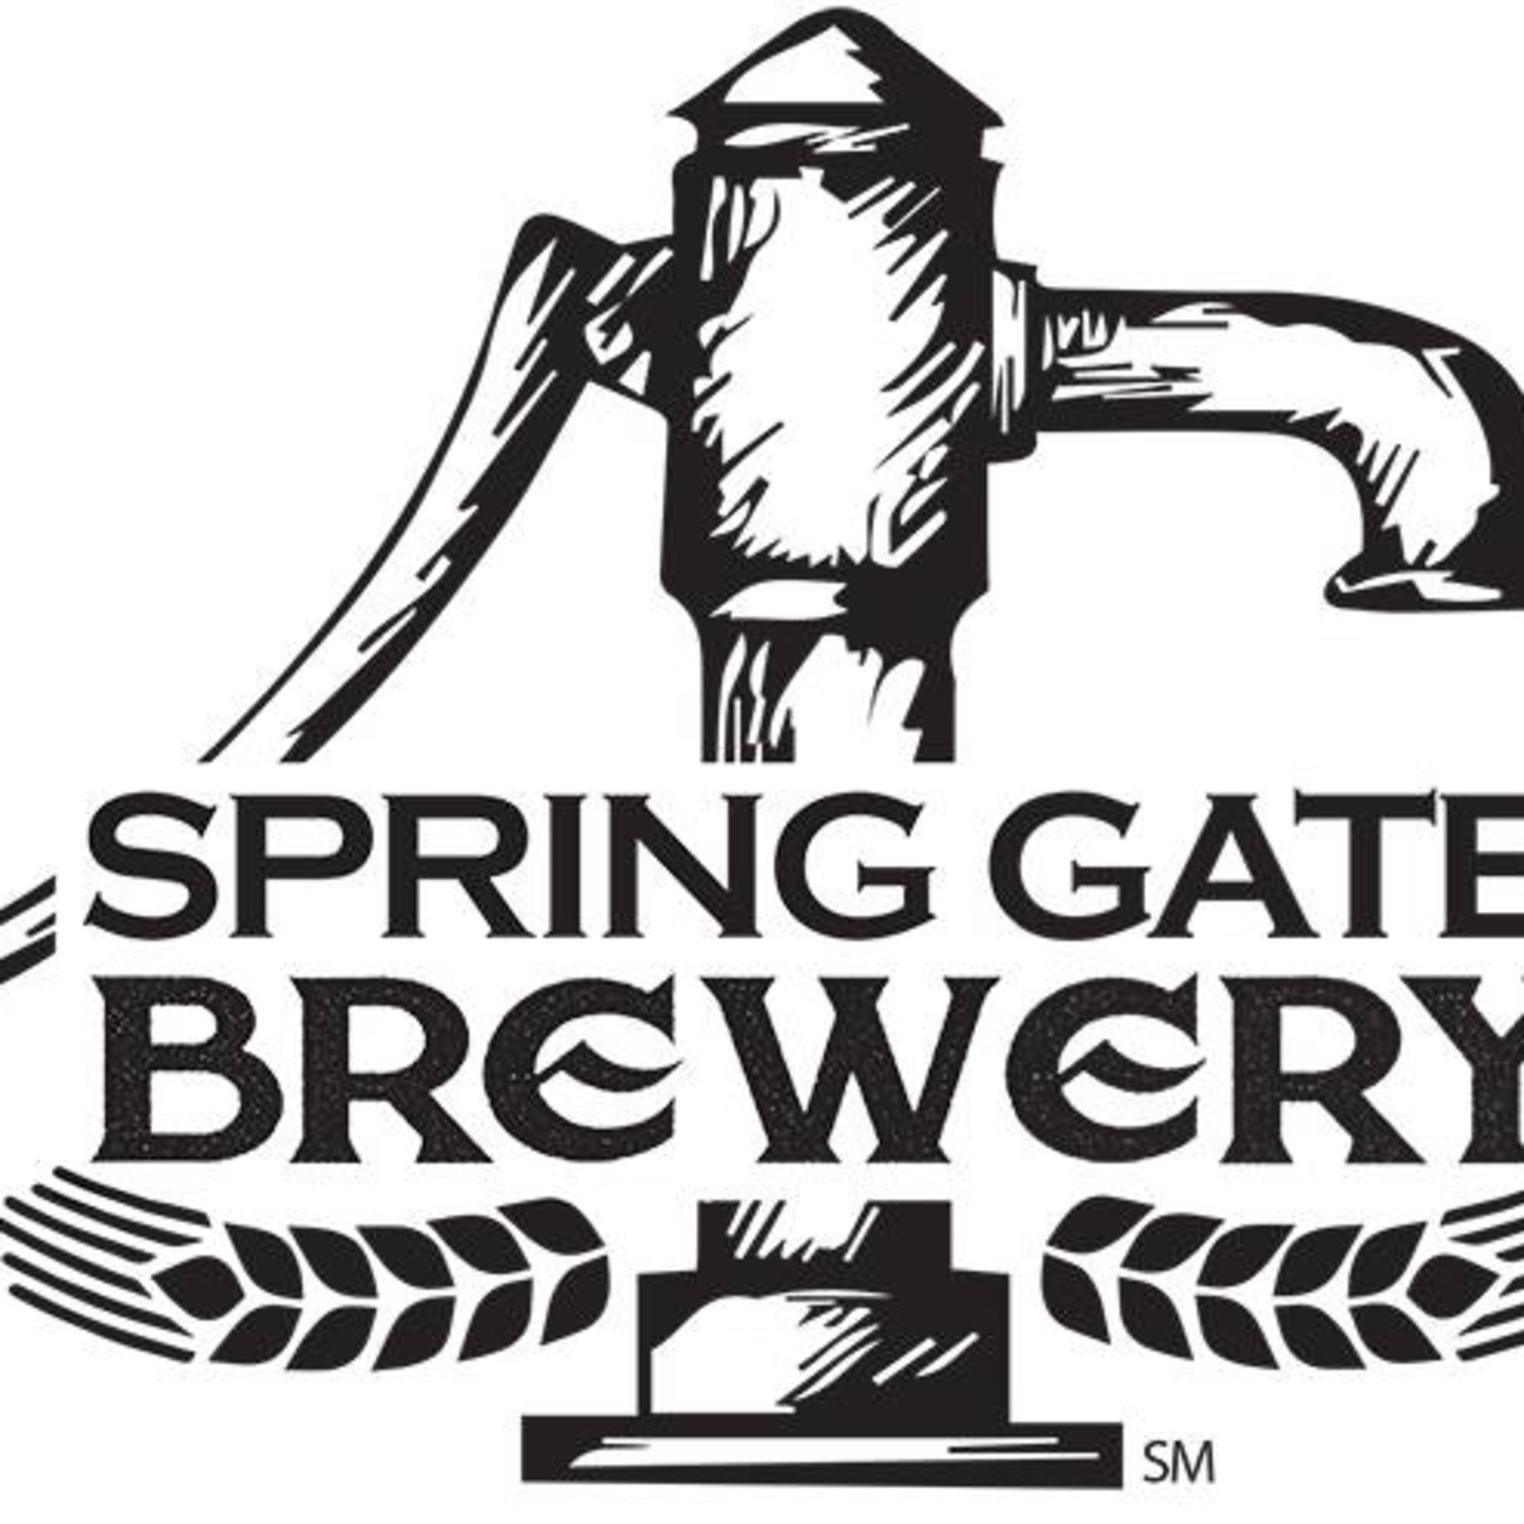 Spring Gate Brewery